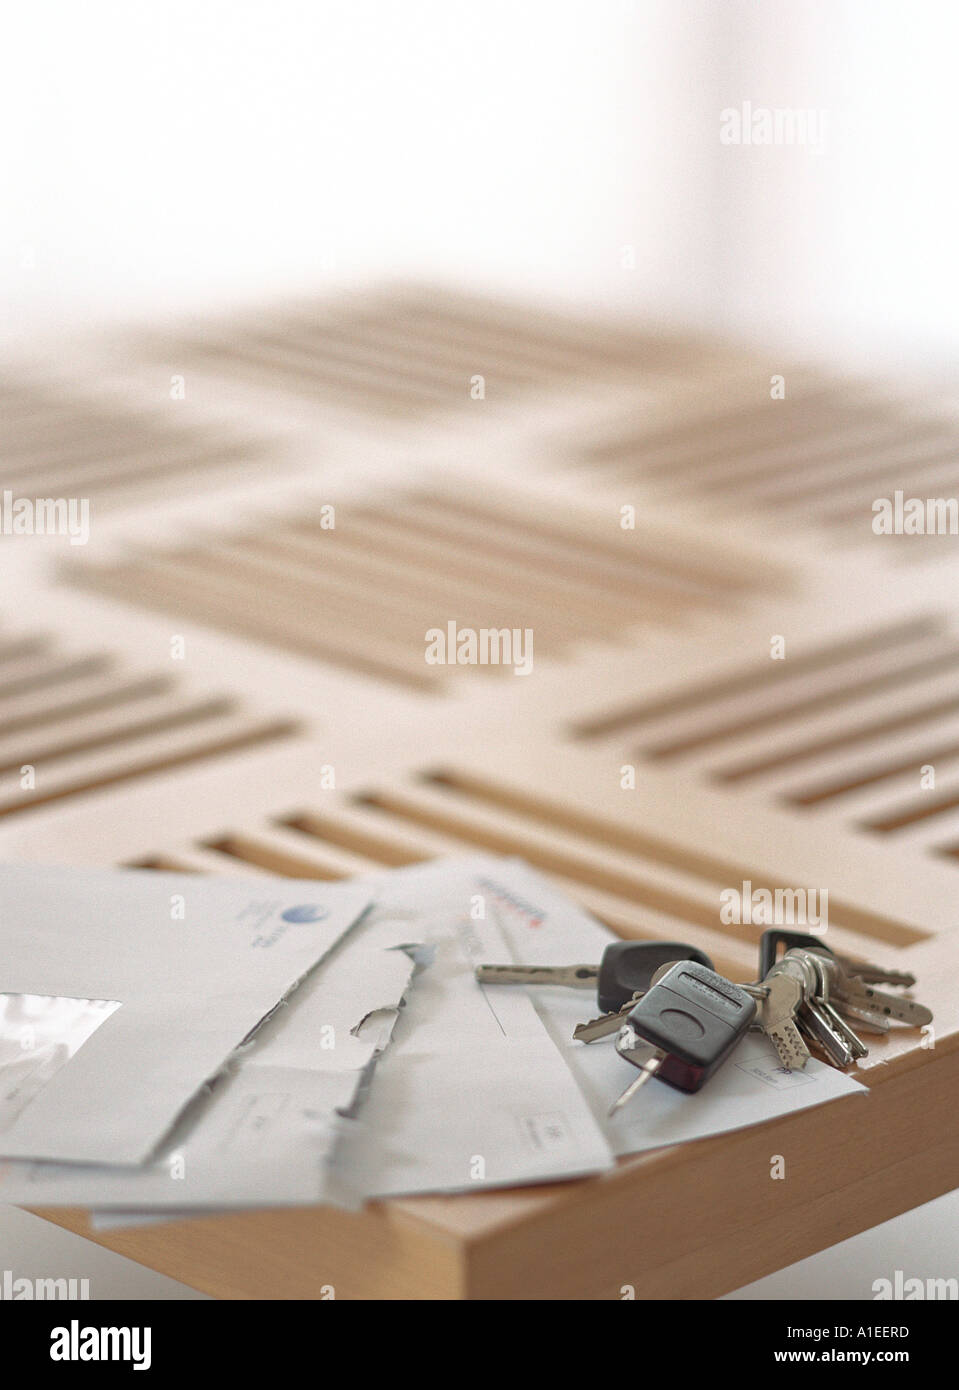 Open bills and keys on corner of table - Stock Image